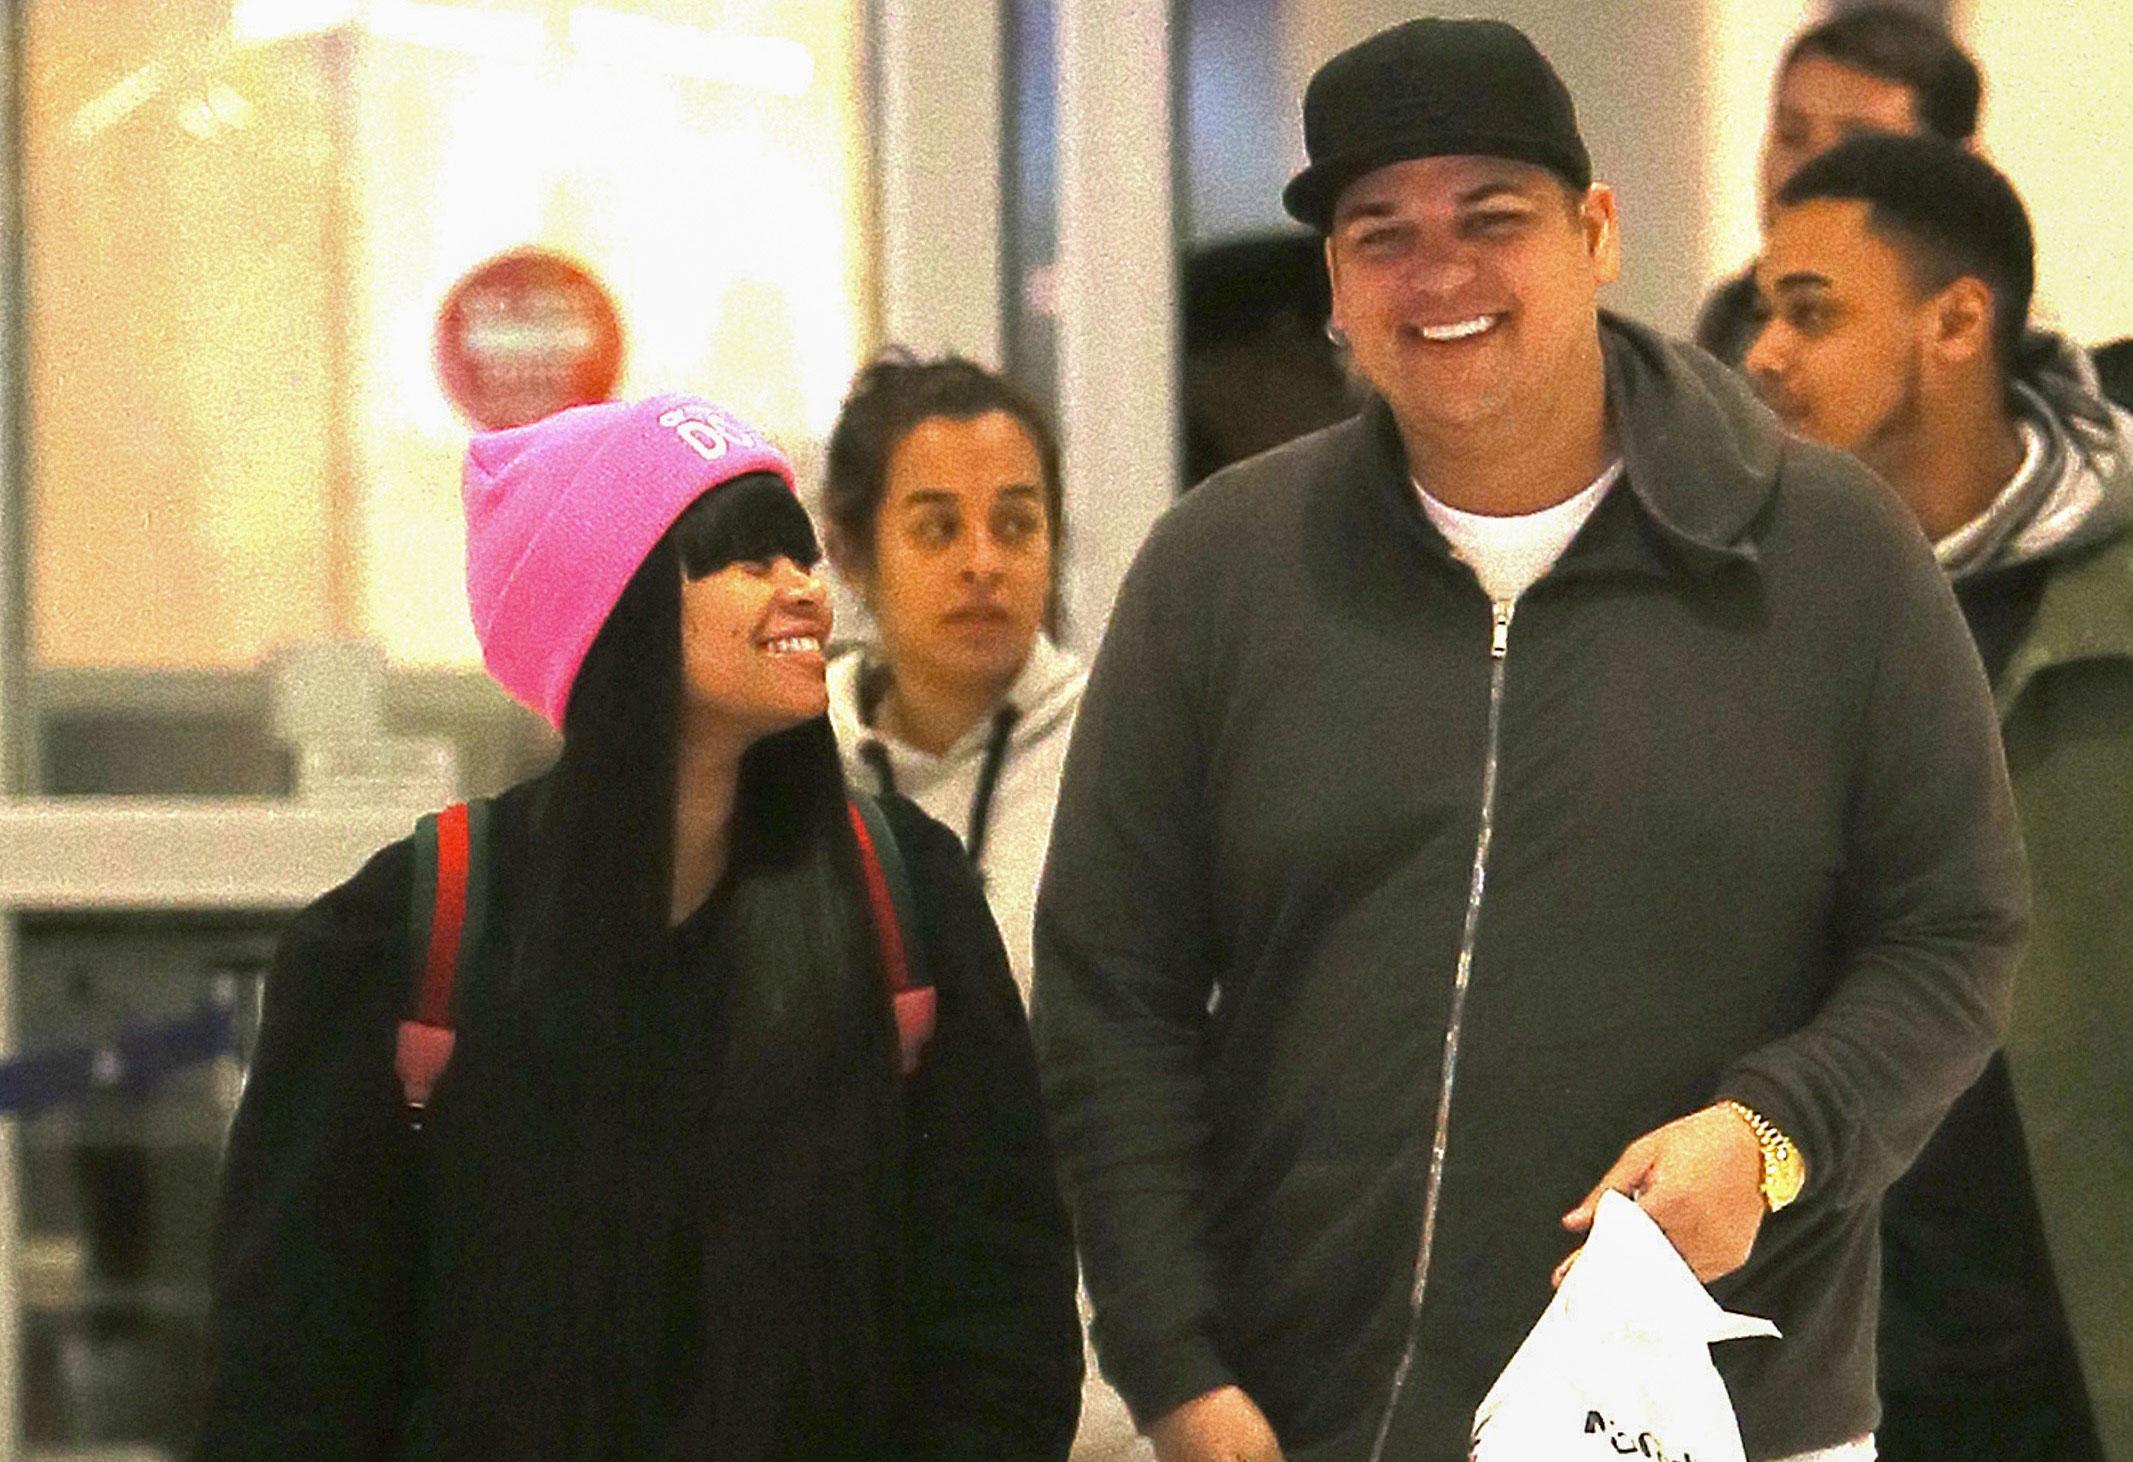 Blac chyna says rob kardashian secret 100k weight loss surgery